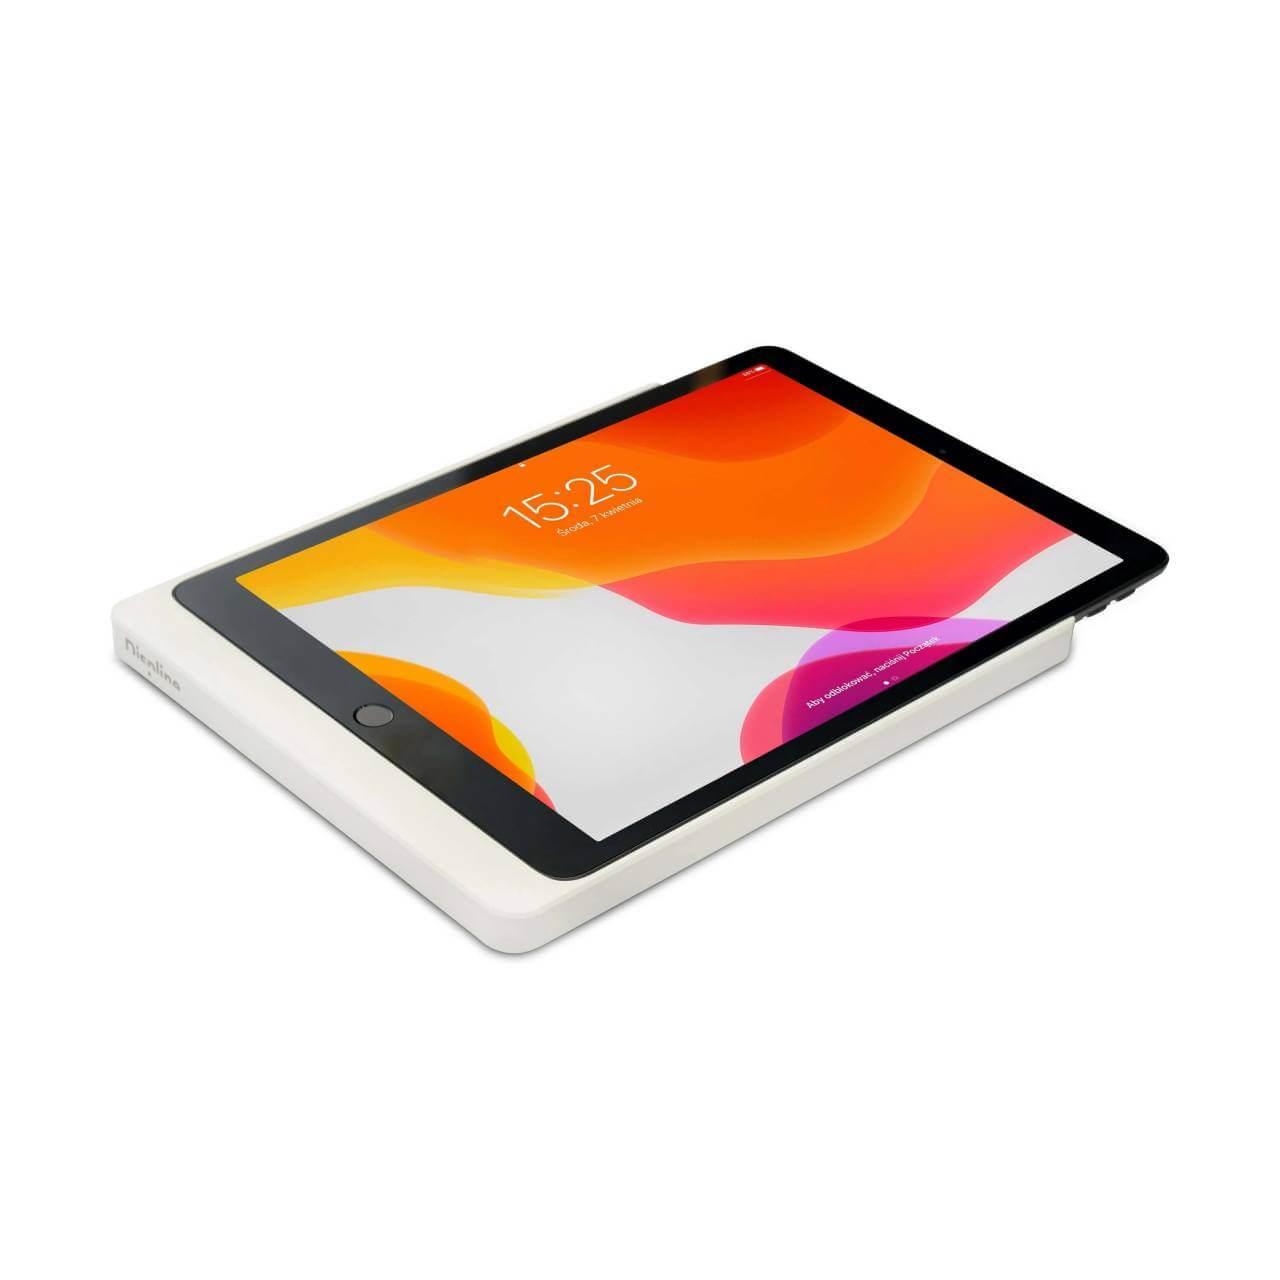 Displine Dame Wall Home - iPad Wandhalterung